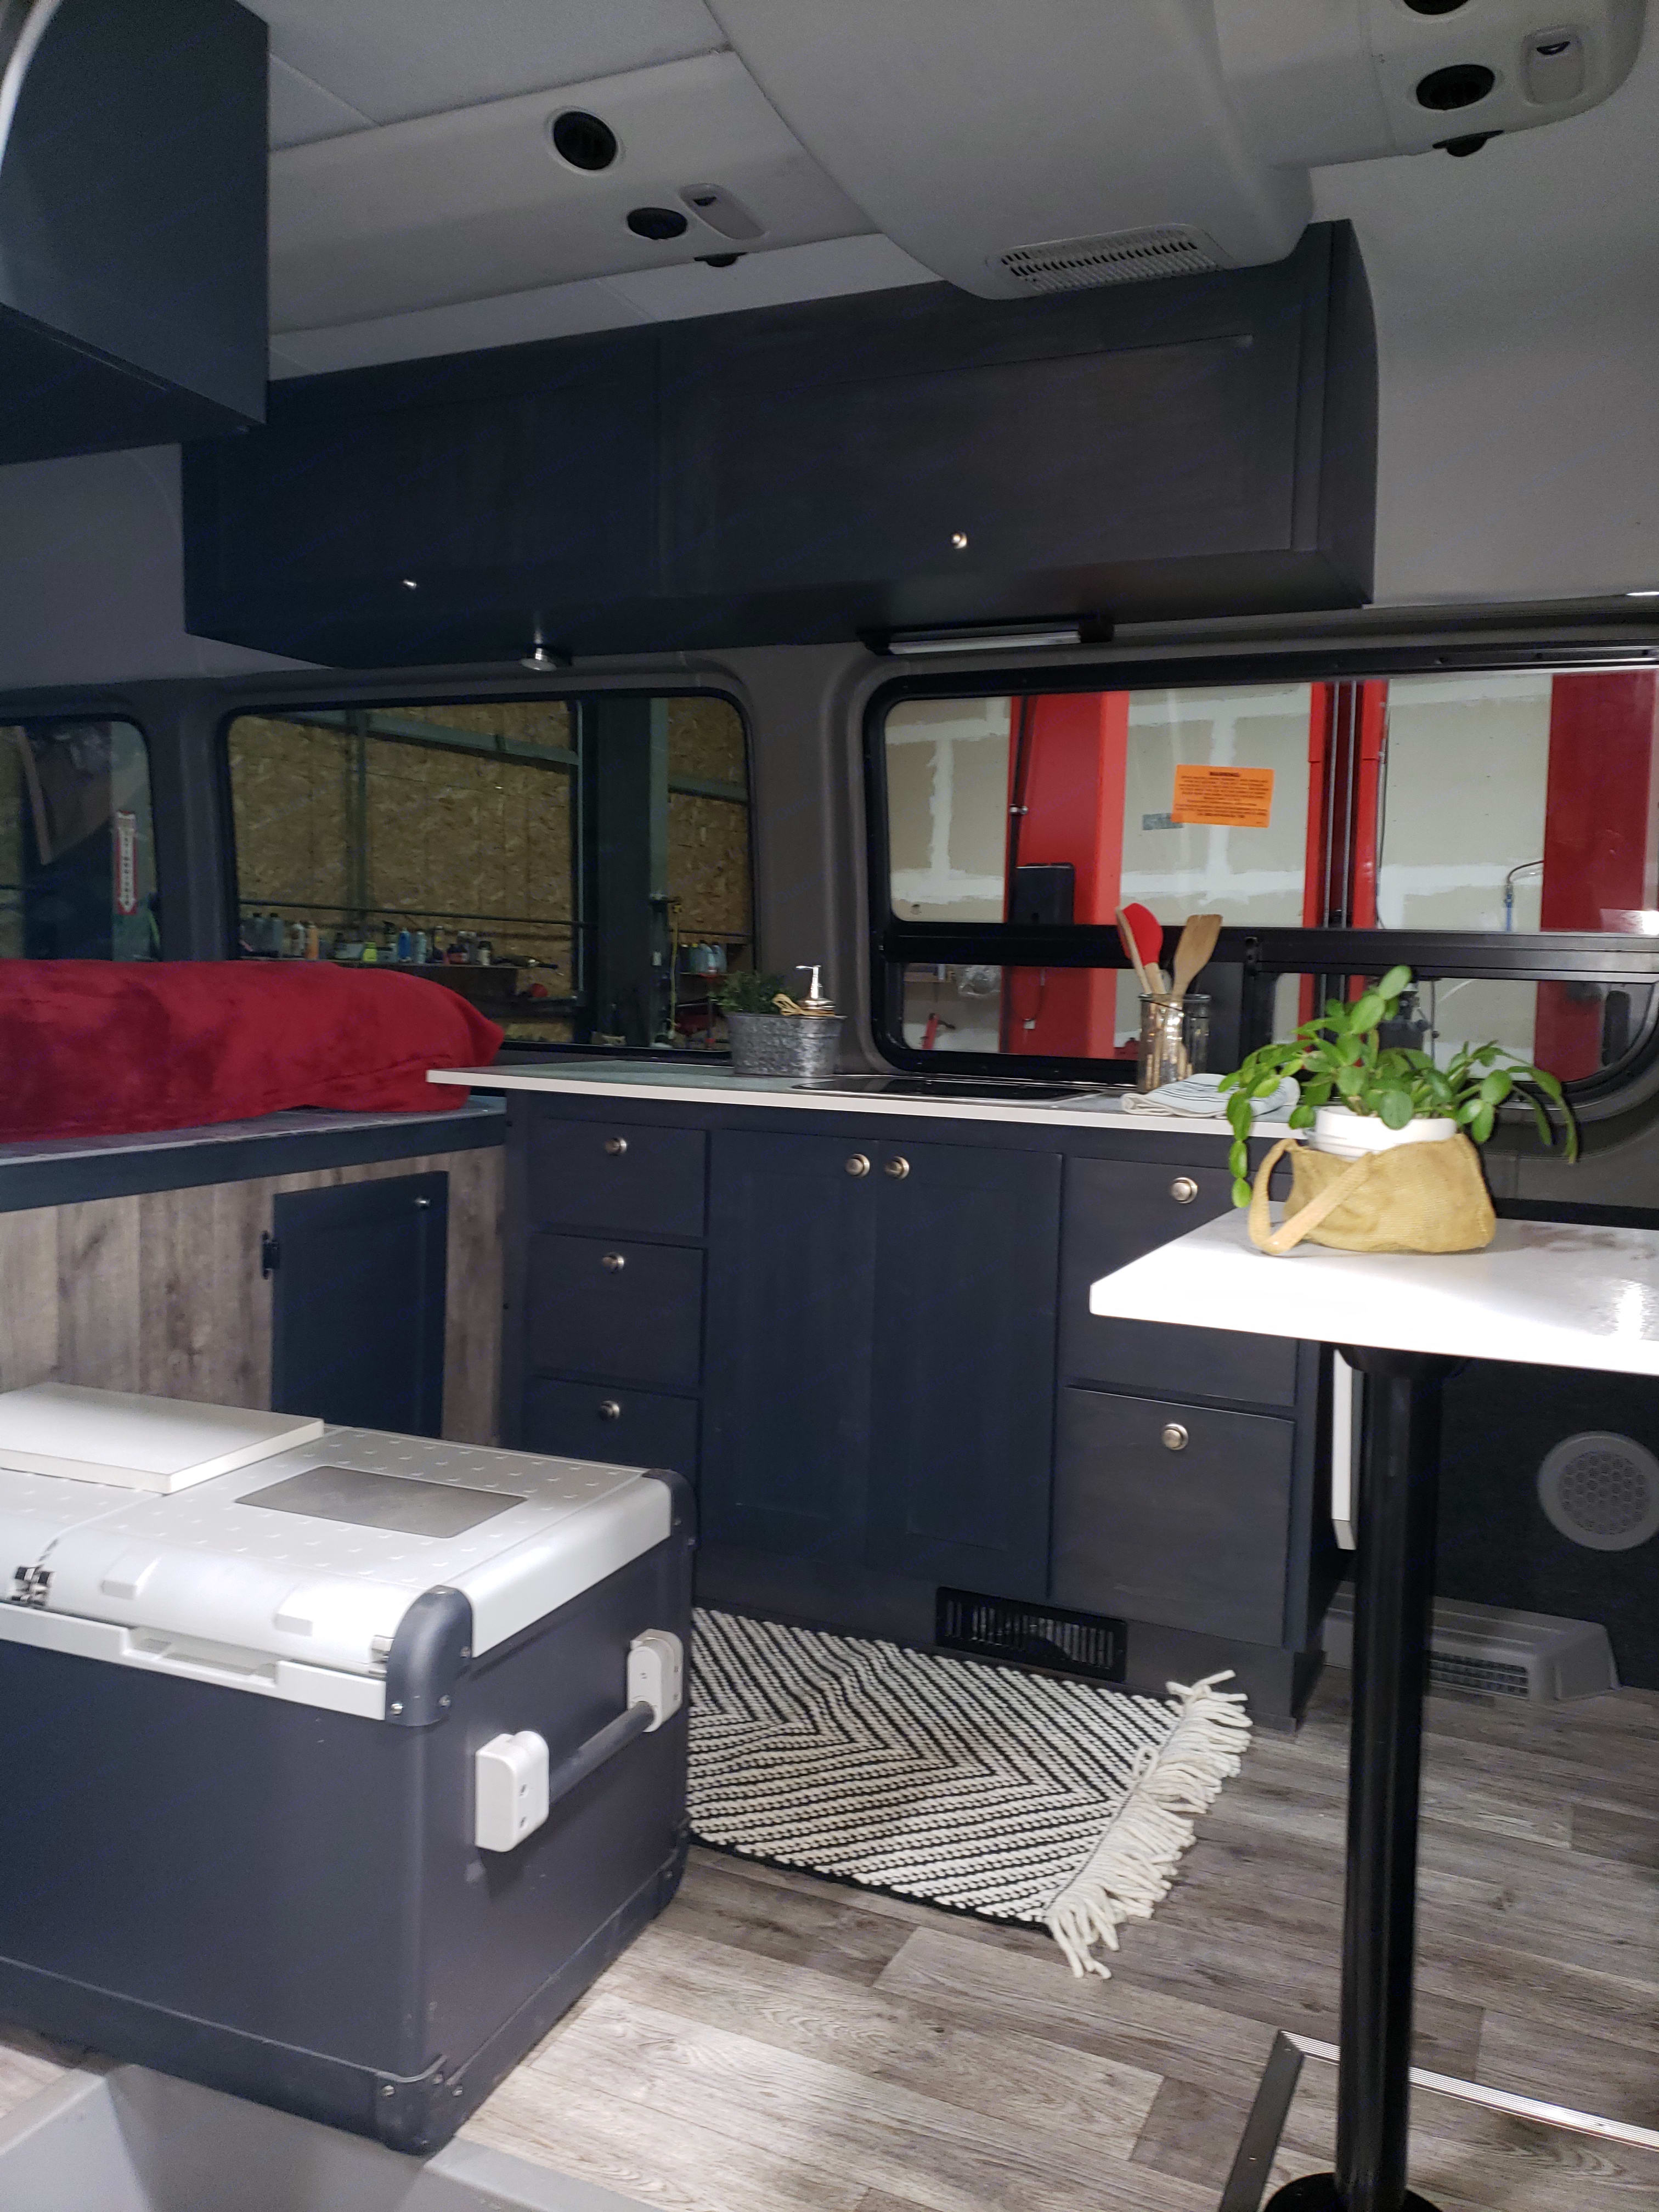 Fridge, Cabinets, Sink, Table, basic cooking supplies. . Mercedes-Benz Sprinter 2013